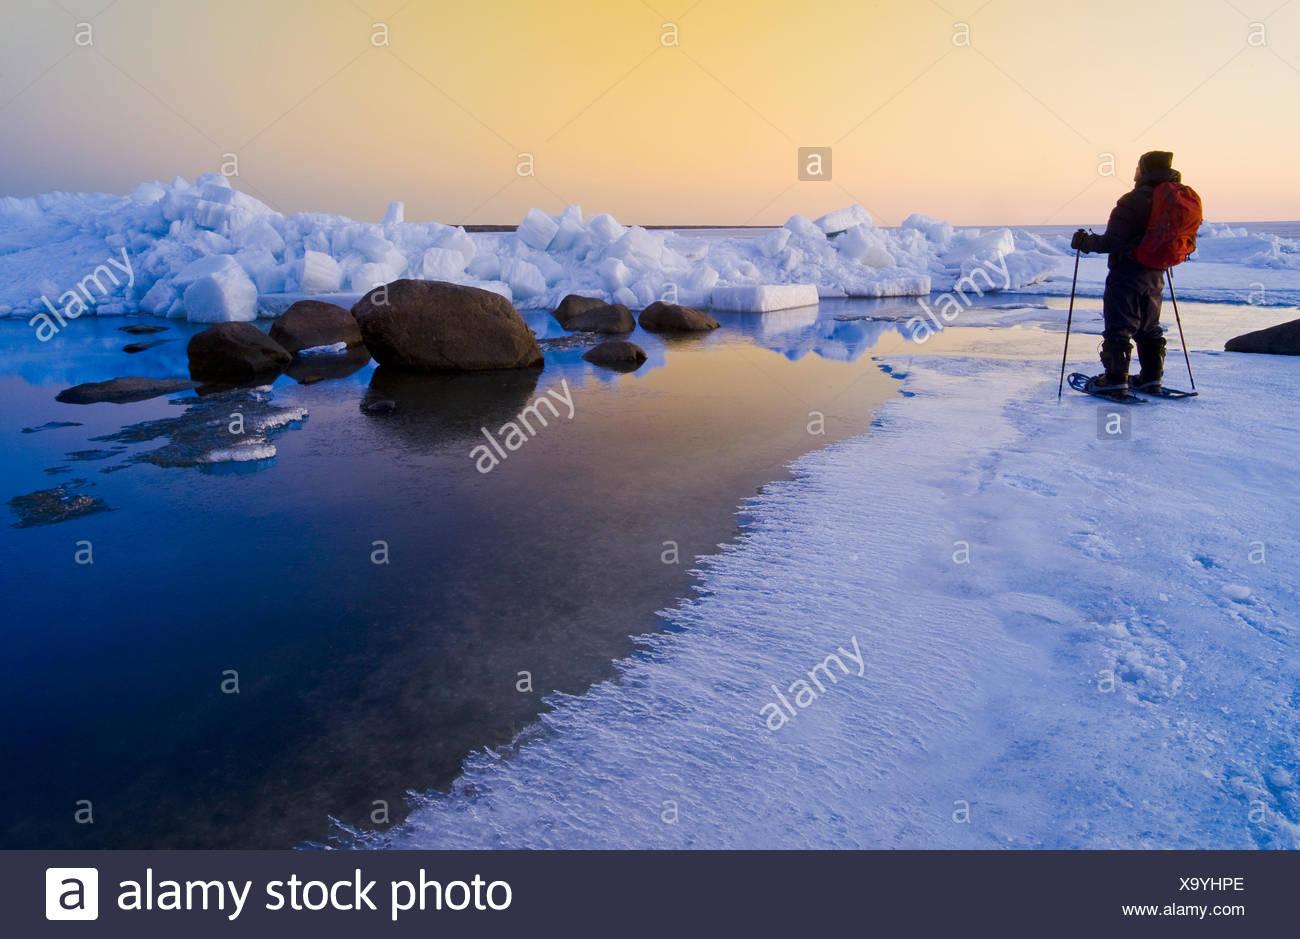 L'homme de la raquette pendant la fonte des glaces au printemps, le lac Winnipeg, Manitoba, Canada Photo Stock